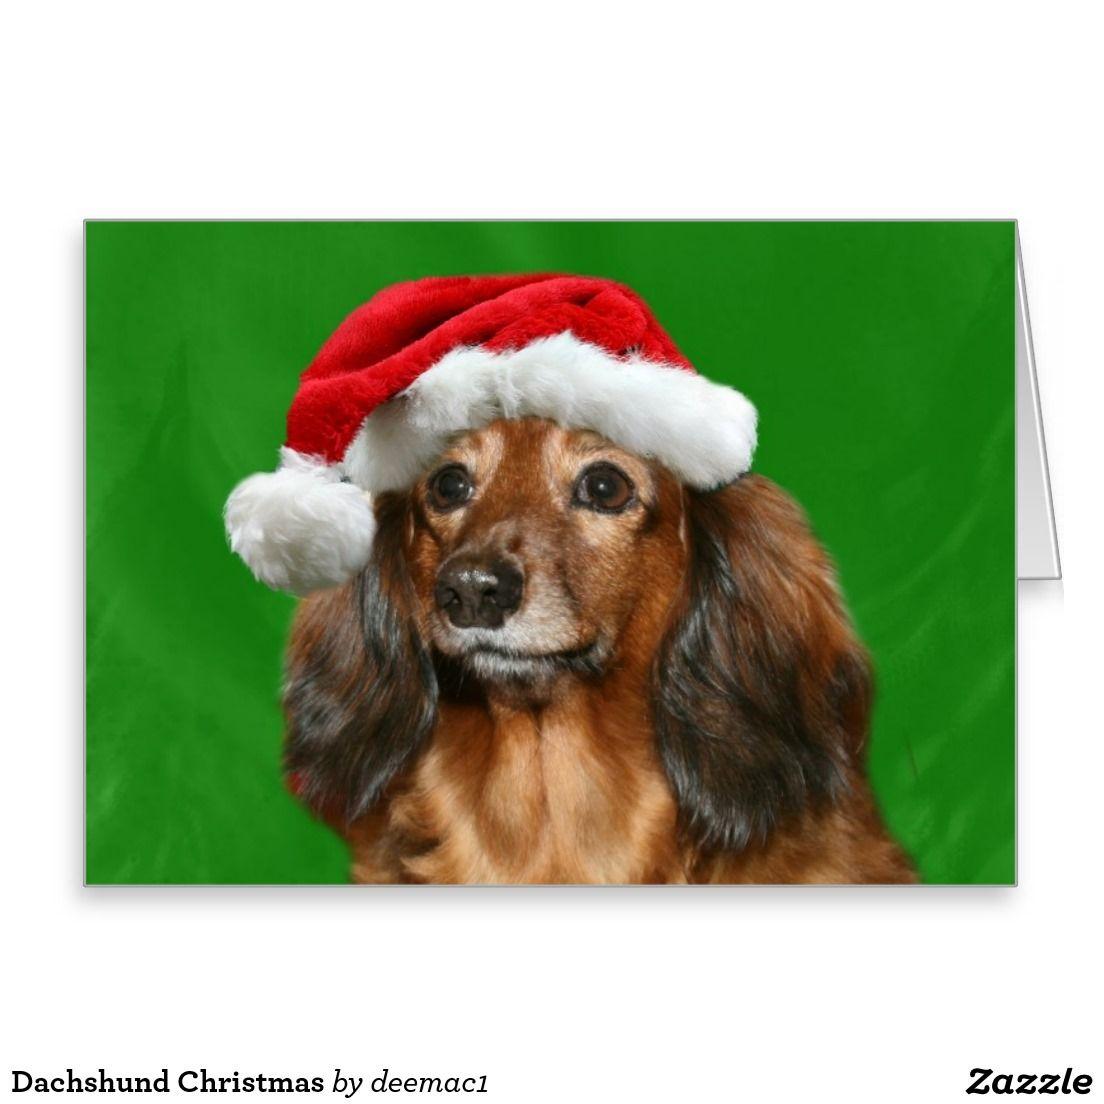 Dachshund christmas card dachshunds christmas greeting cards dachshund christmas greeting card kristyandbryce Image collections